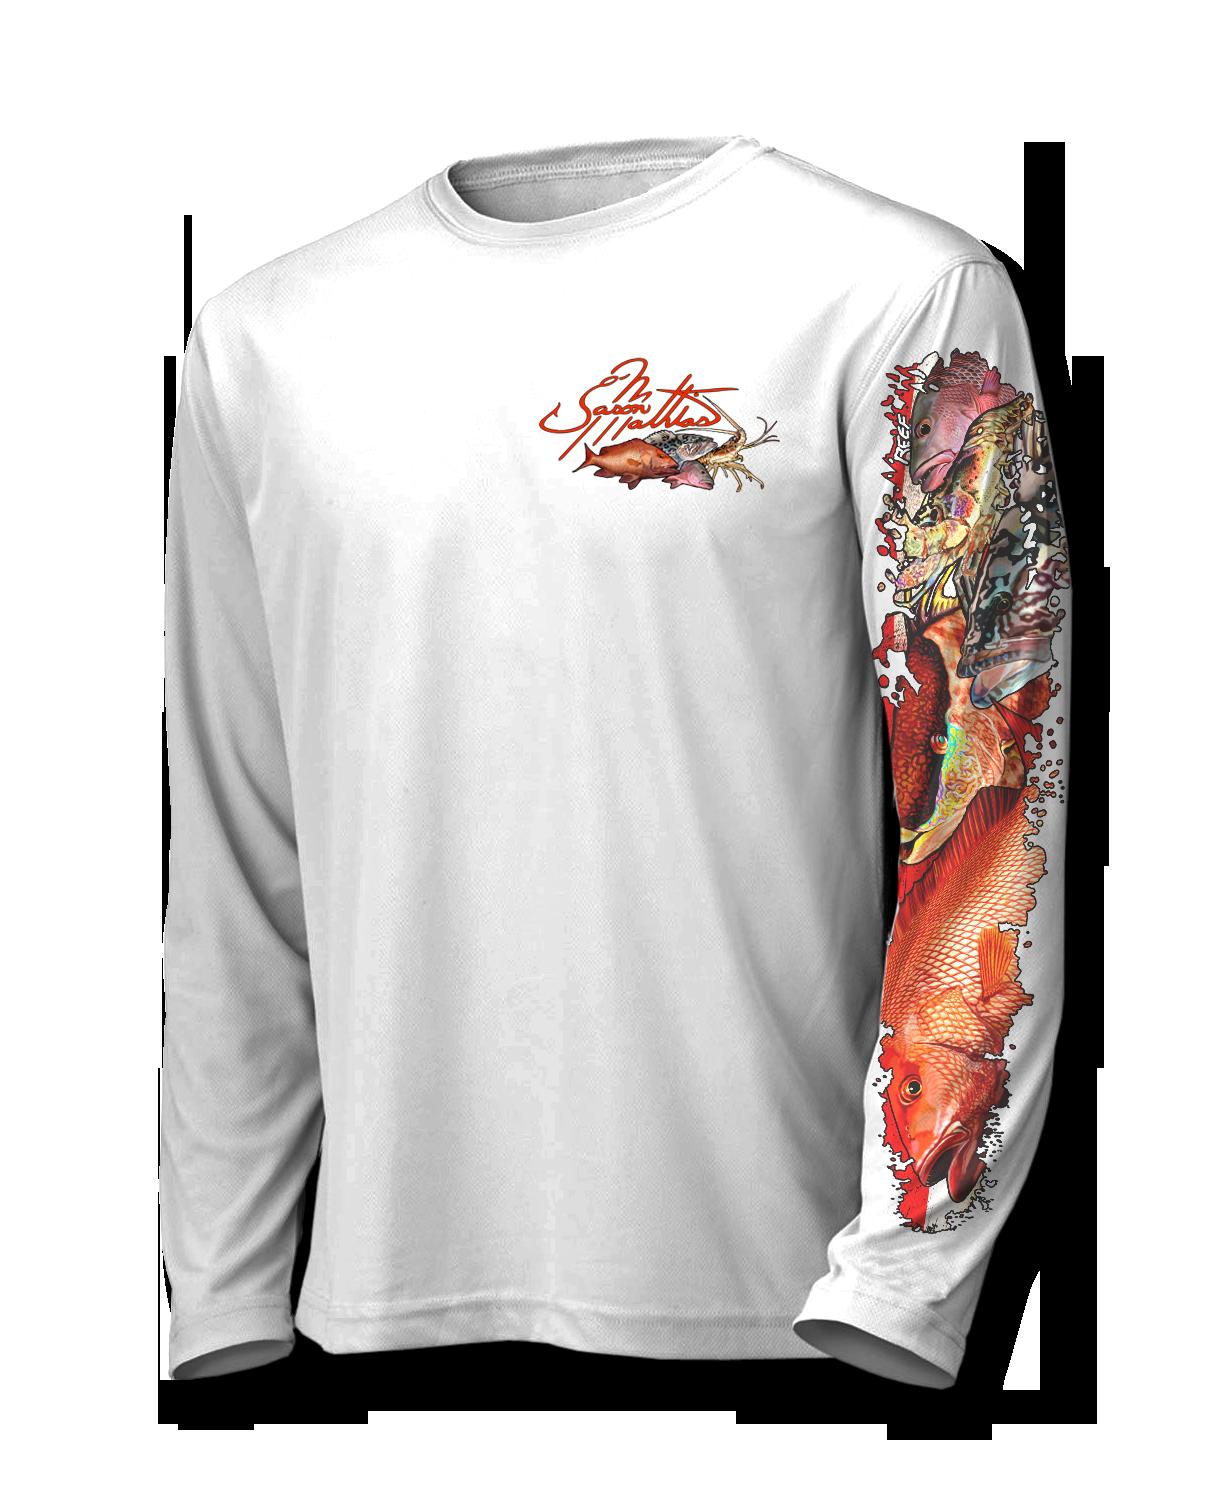 reef-slam-jason-mathias-shirts.png